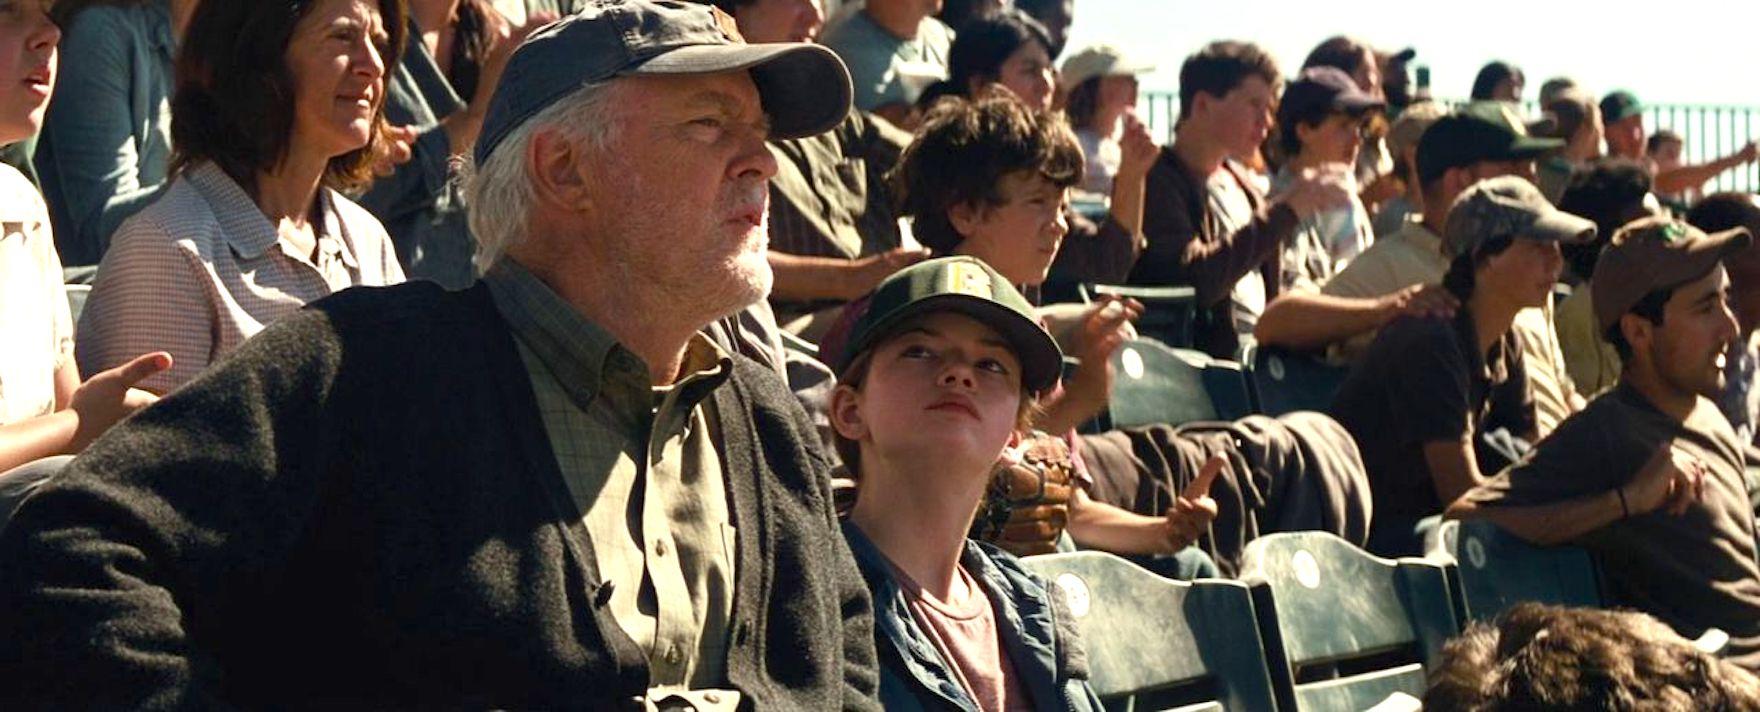 John Lithgow and Mackenzie Foy in Interstellar (2014)